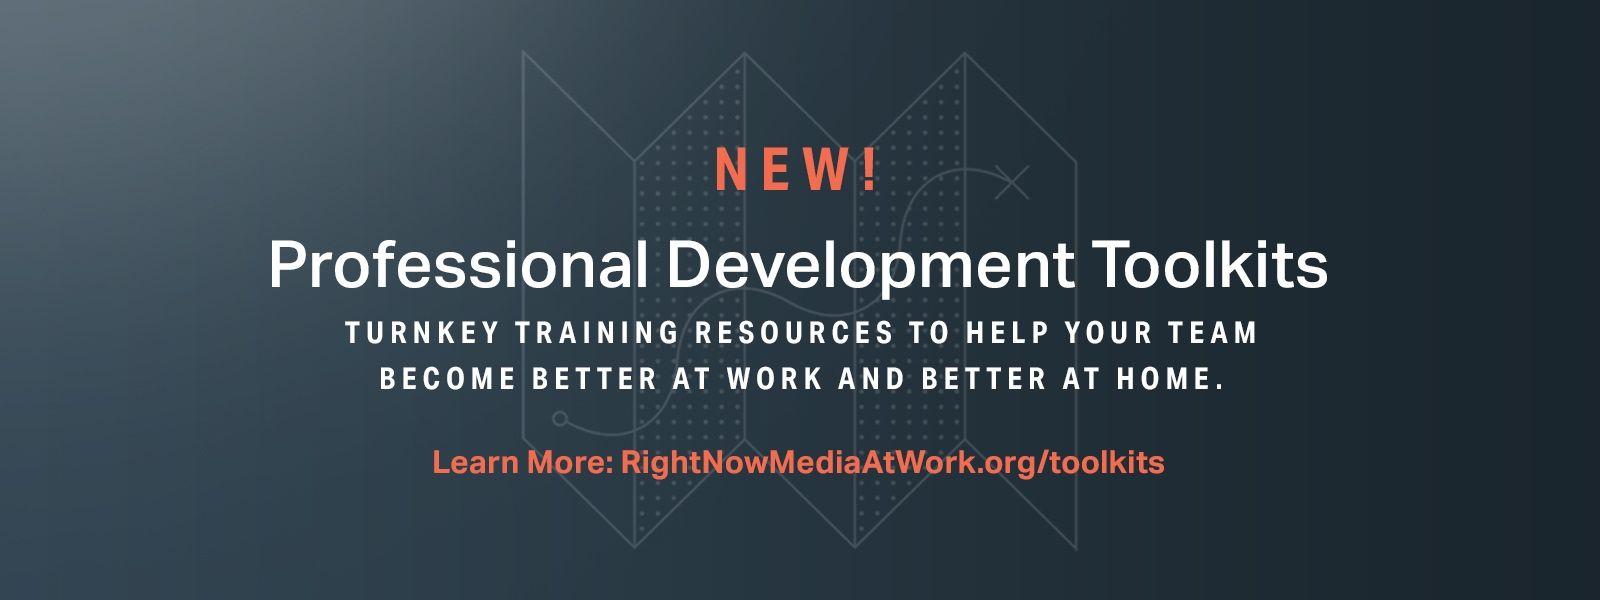 Professional Development Toolkits